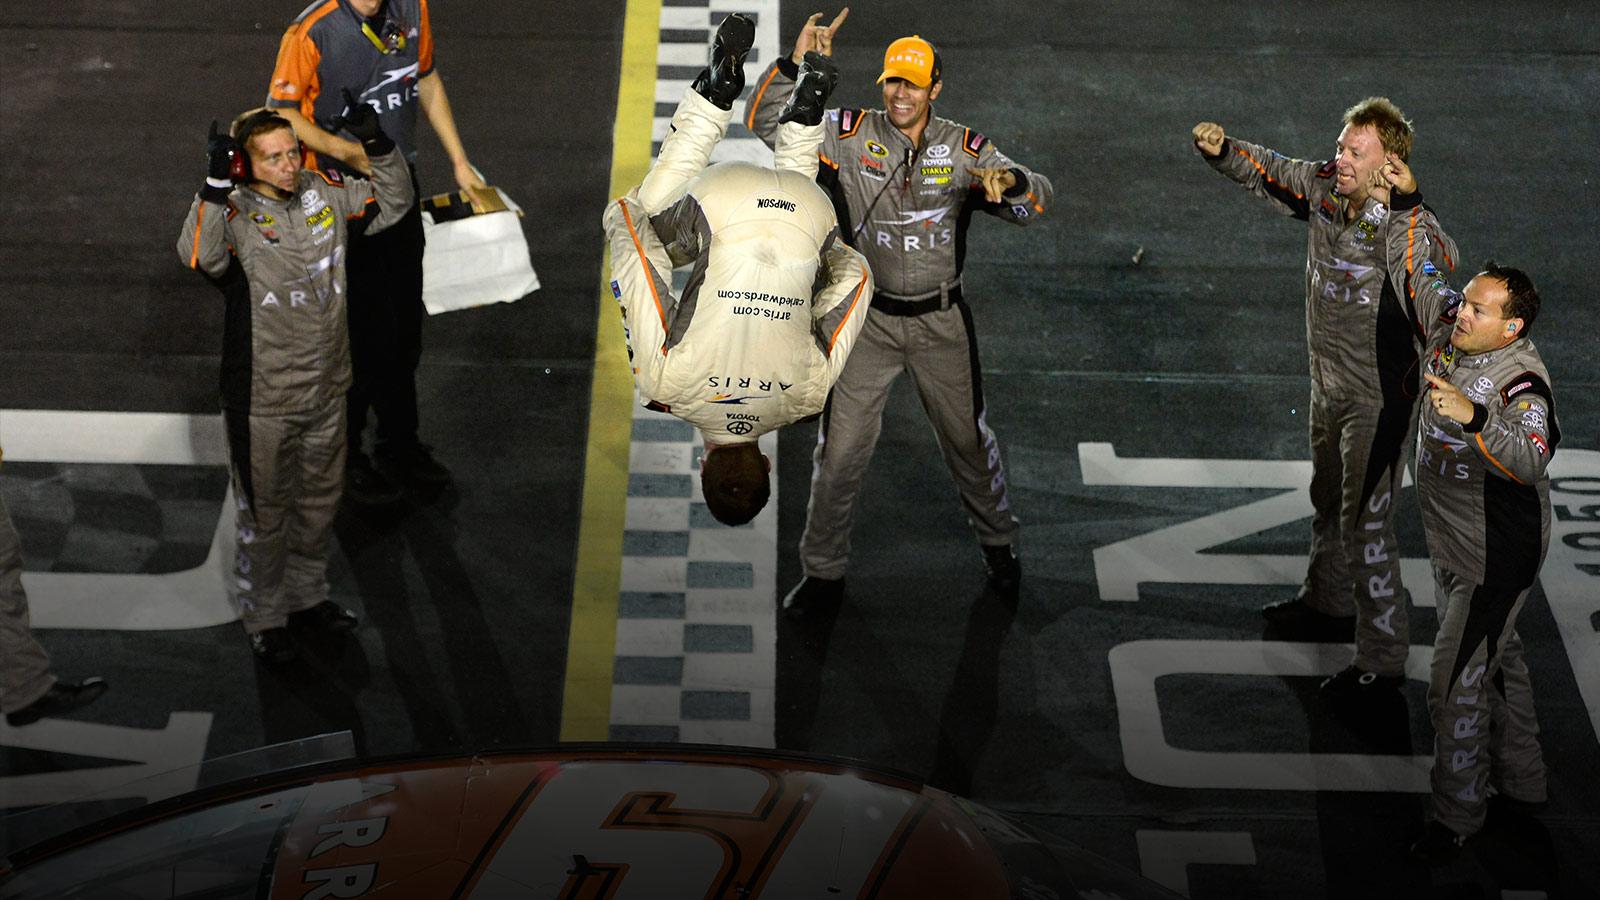 011716-NASCAR-Flippingout-PI-CDH